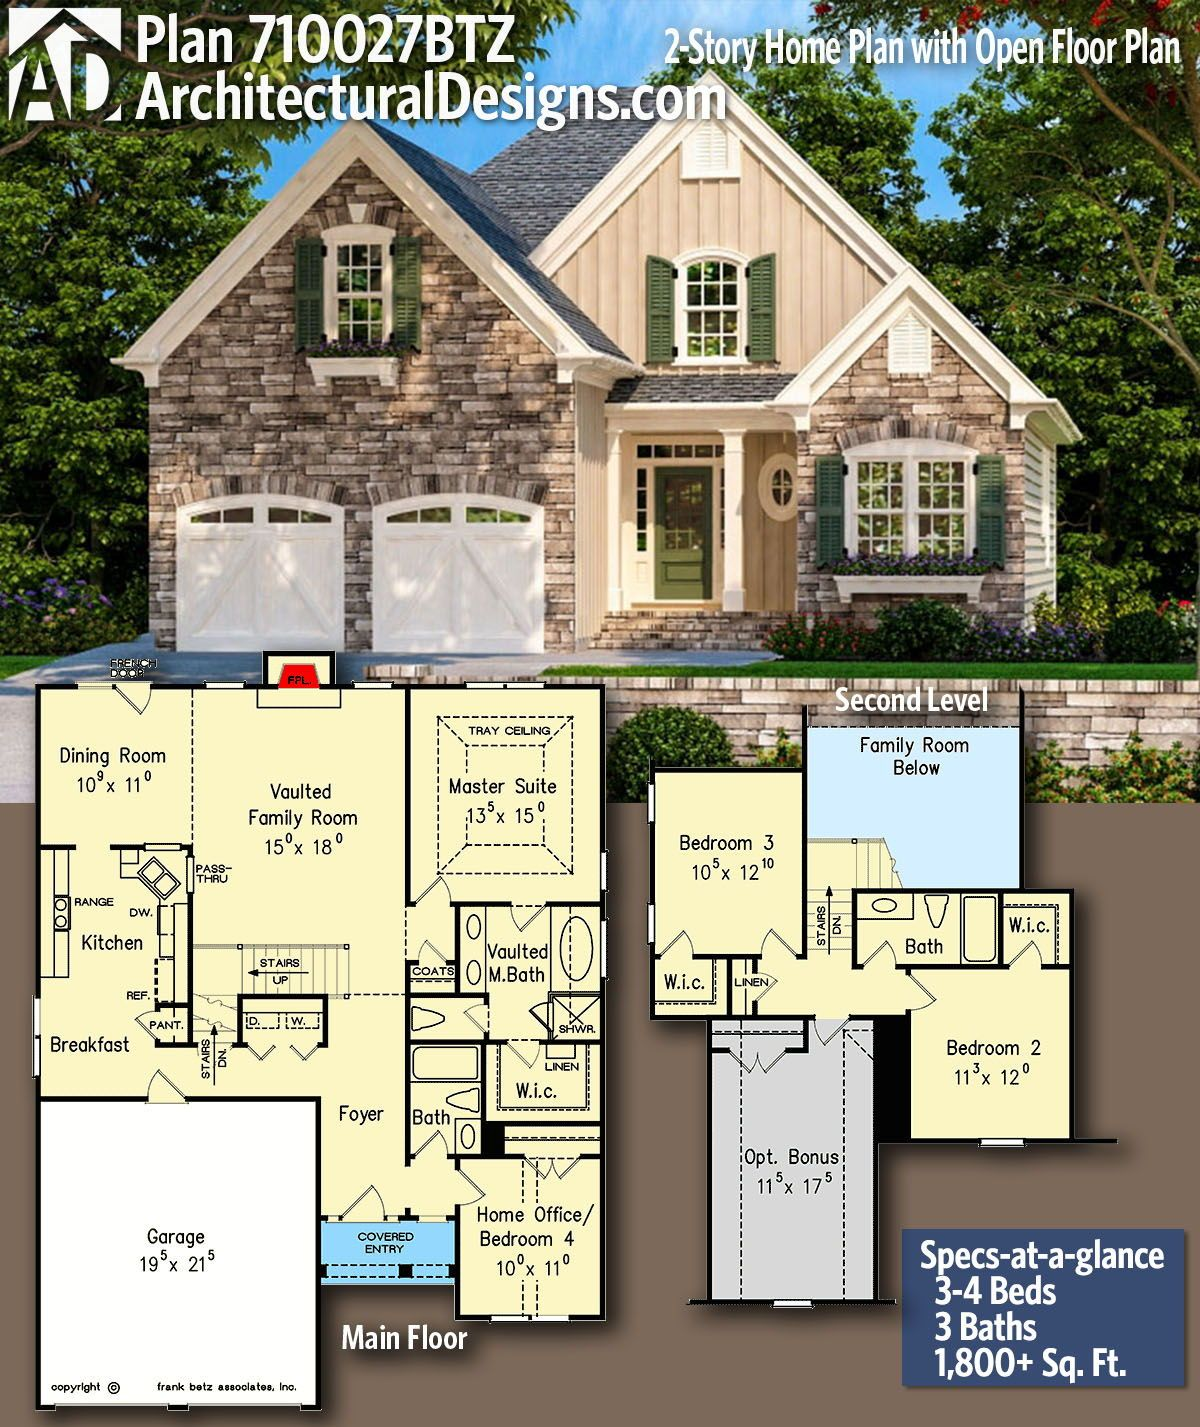 Plan 710027btz 2 Story Home Plan With Open Floor Plan Craftsman House Plans Architectural Design House Plans Floor Plans